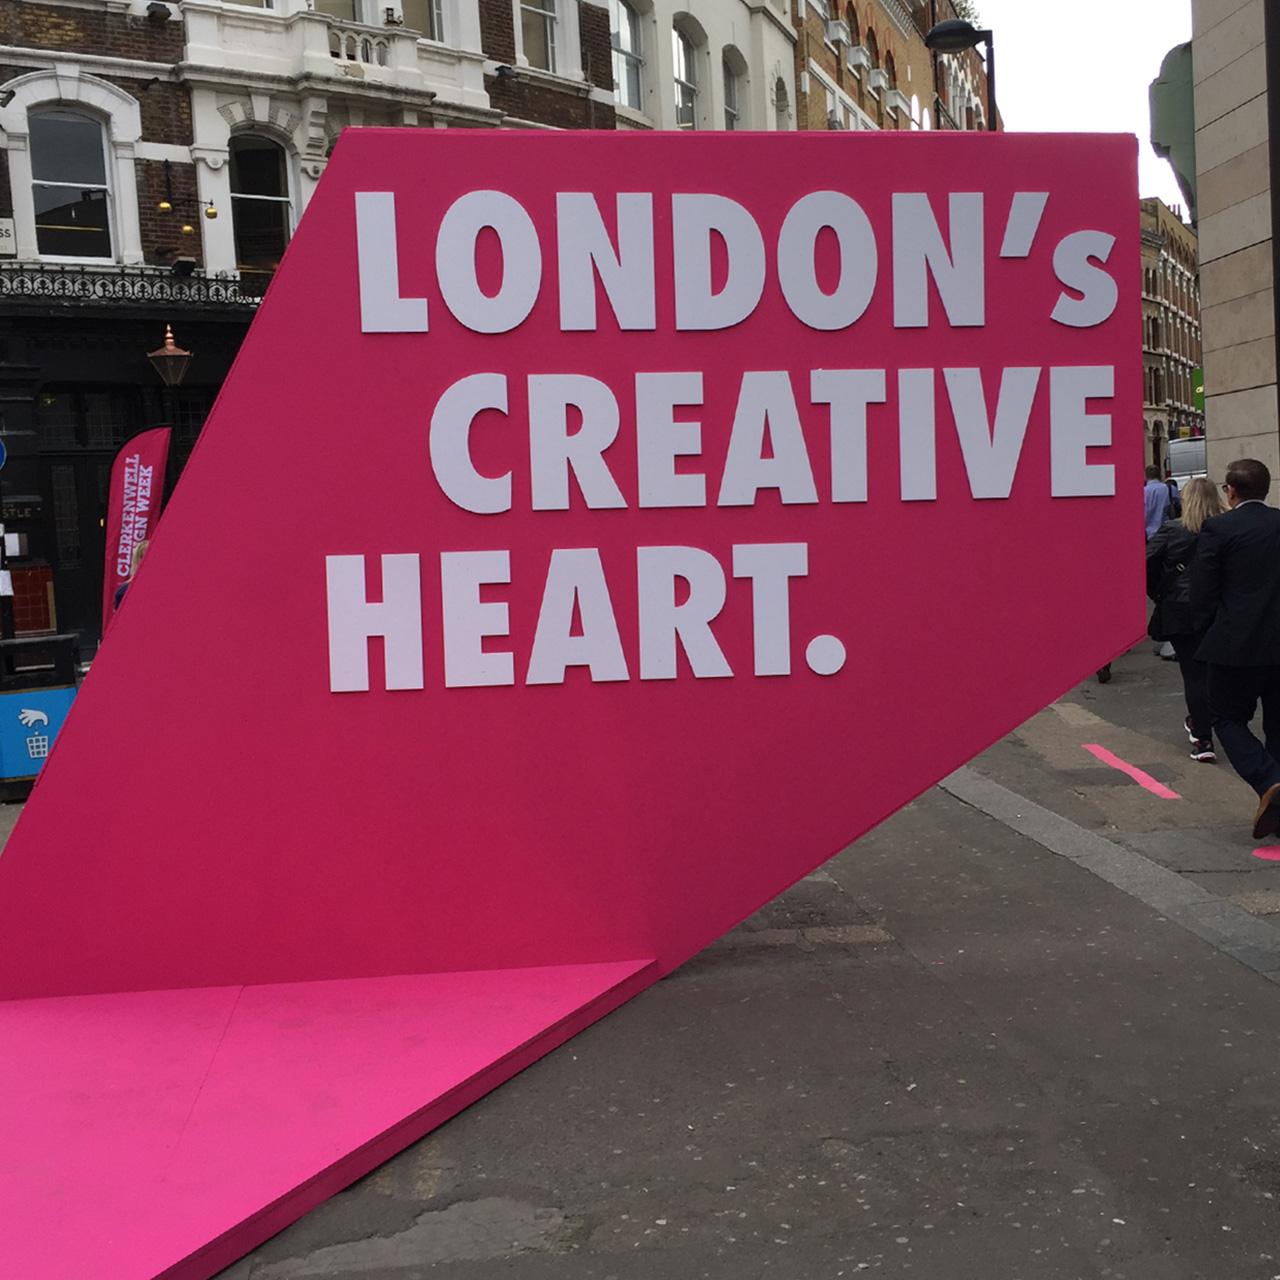 CDW17: Experiencing Design at Clerkenwell Design Week